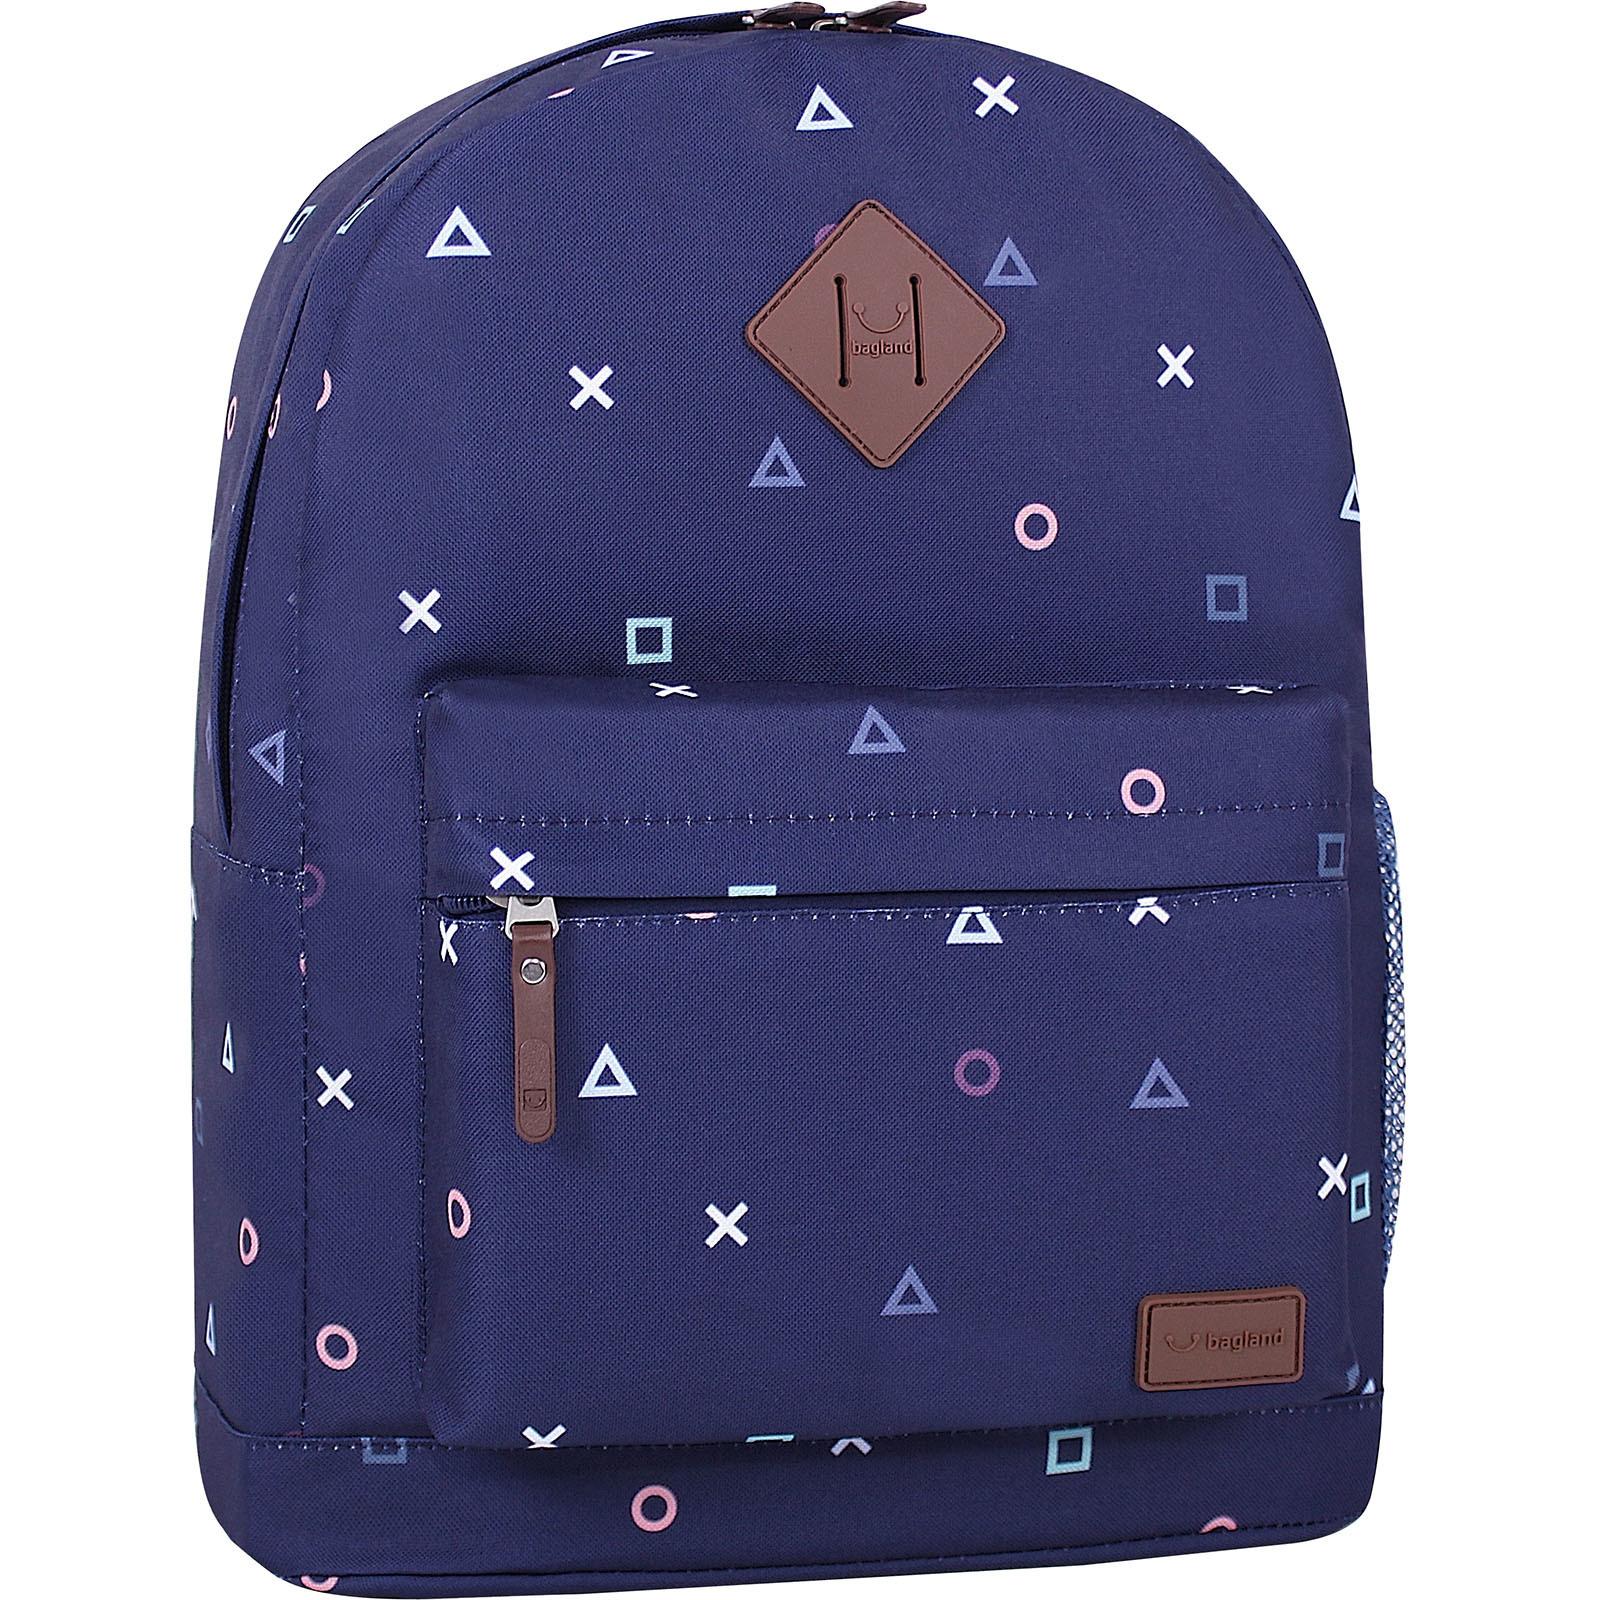 Молодежные рюкзаки Рюкзак Bagland Молодежный 17 л. сублимация 749 (00533664) IMG_6919_суб.749_.JPG